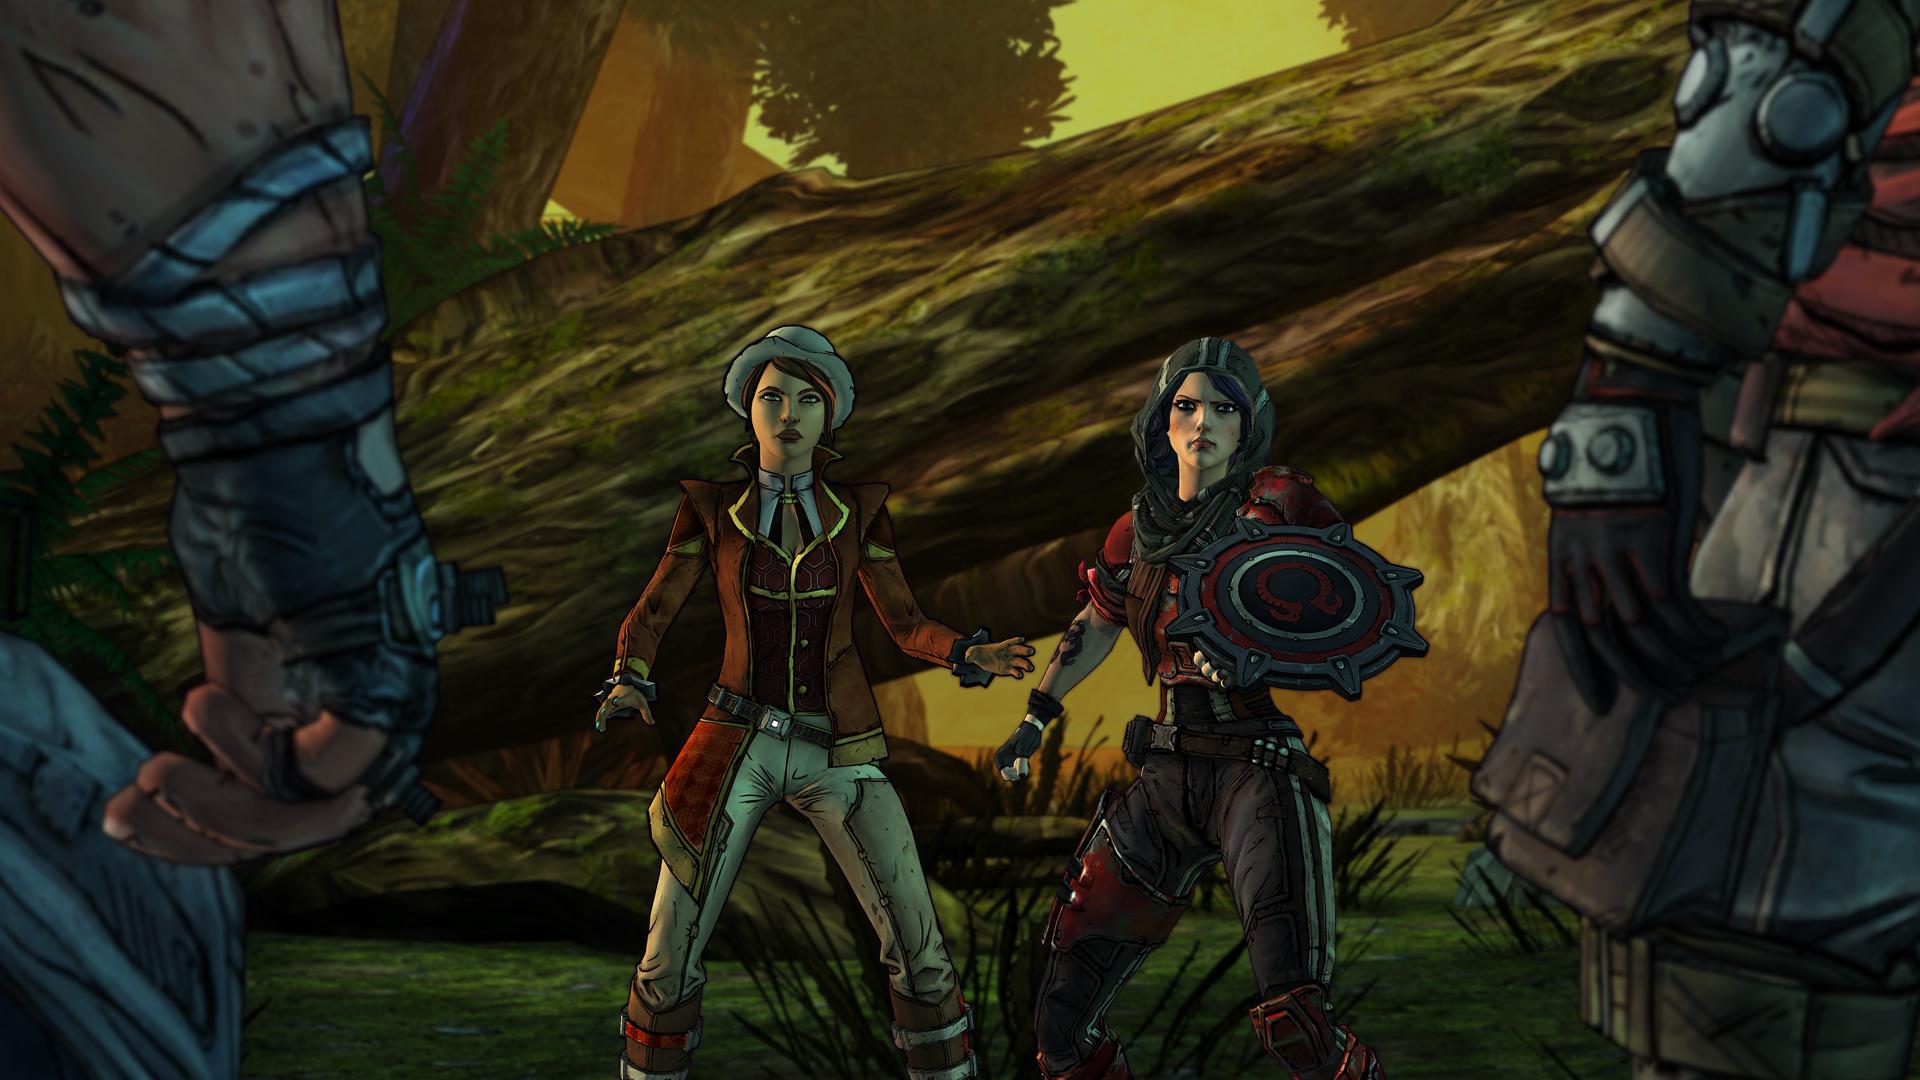 Terceiro capítulo de Tales from the Borderlands será lançado no dia 23